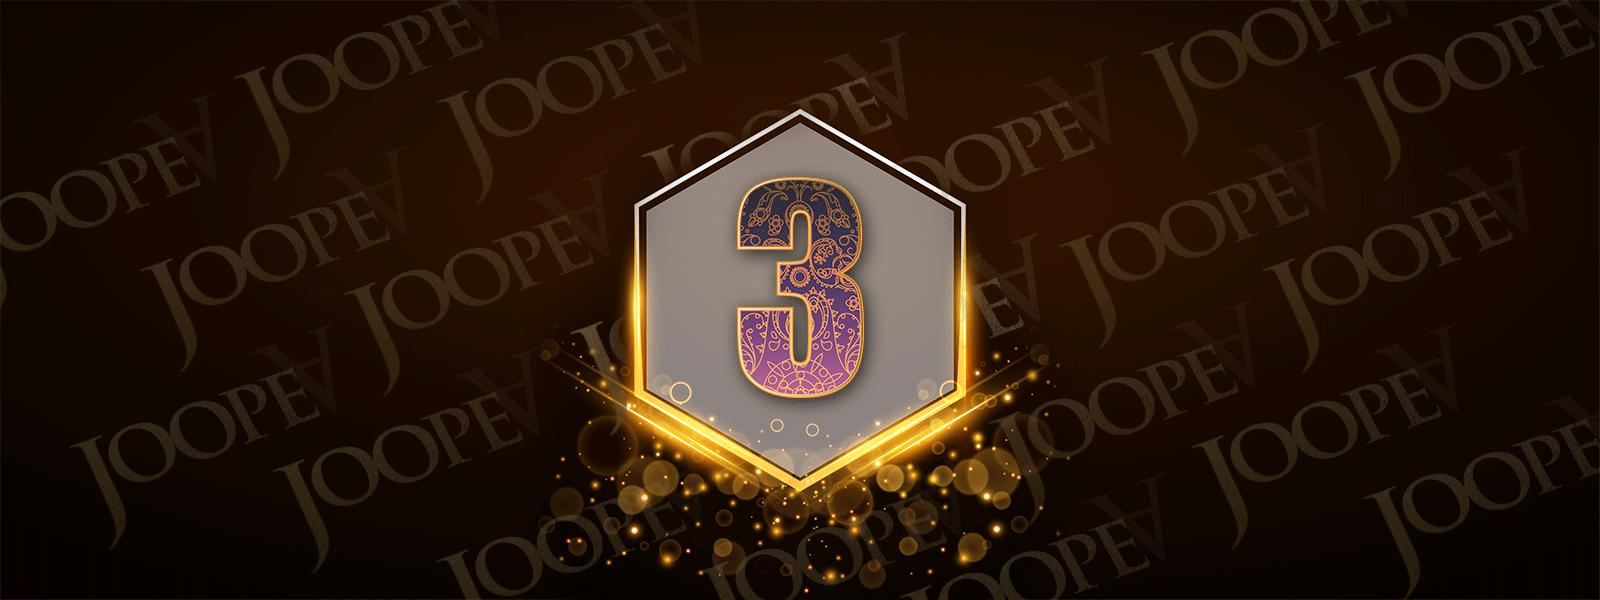 JoopeA's 3rd Anniversary